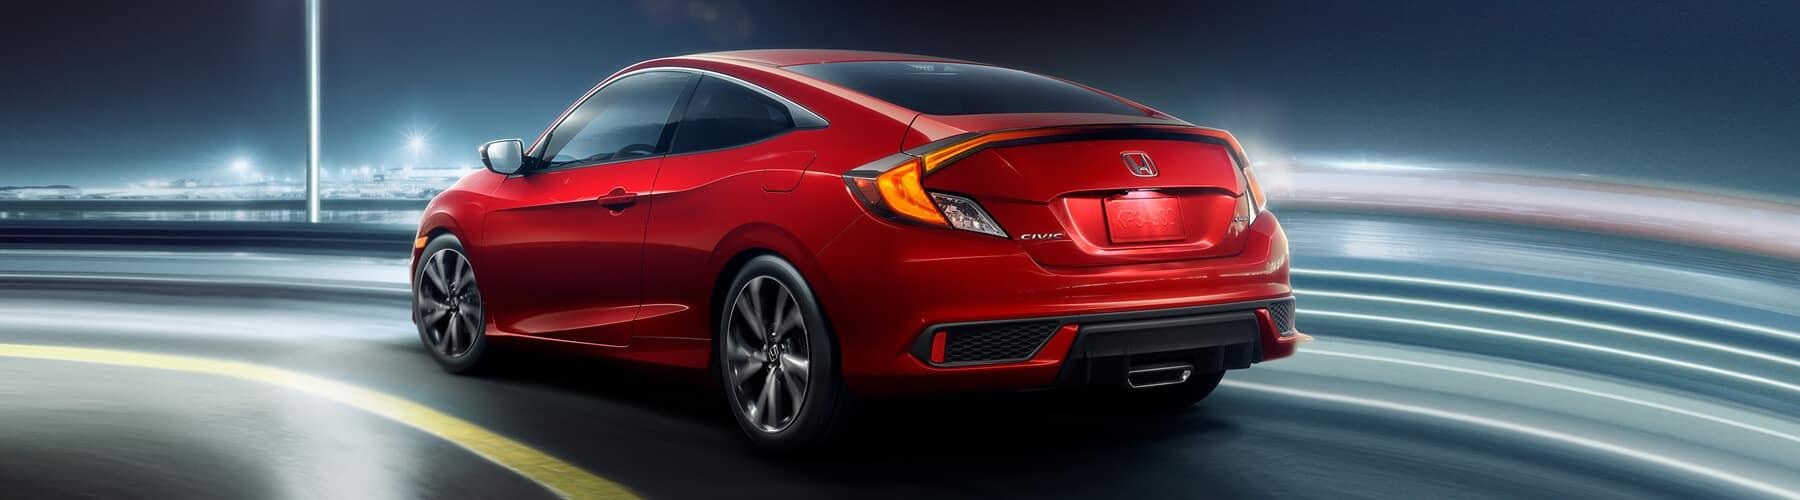 2020 Honda Civic Coupe Slider